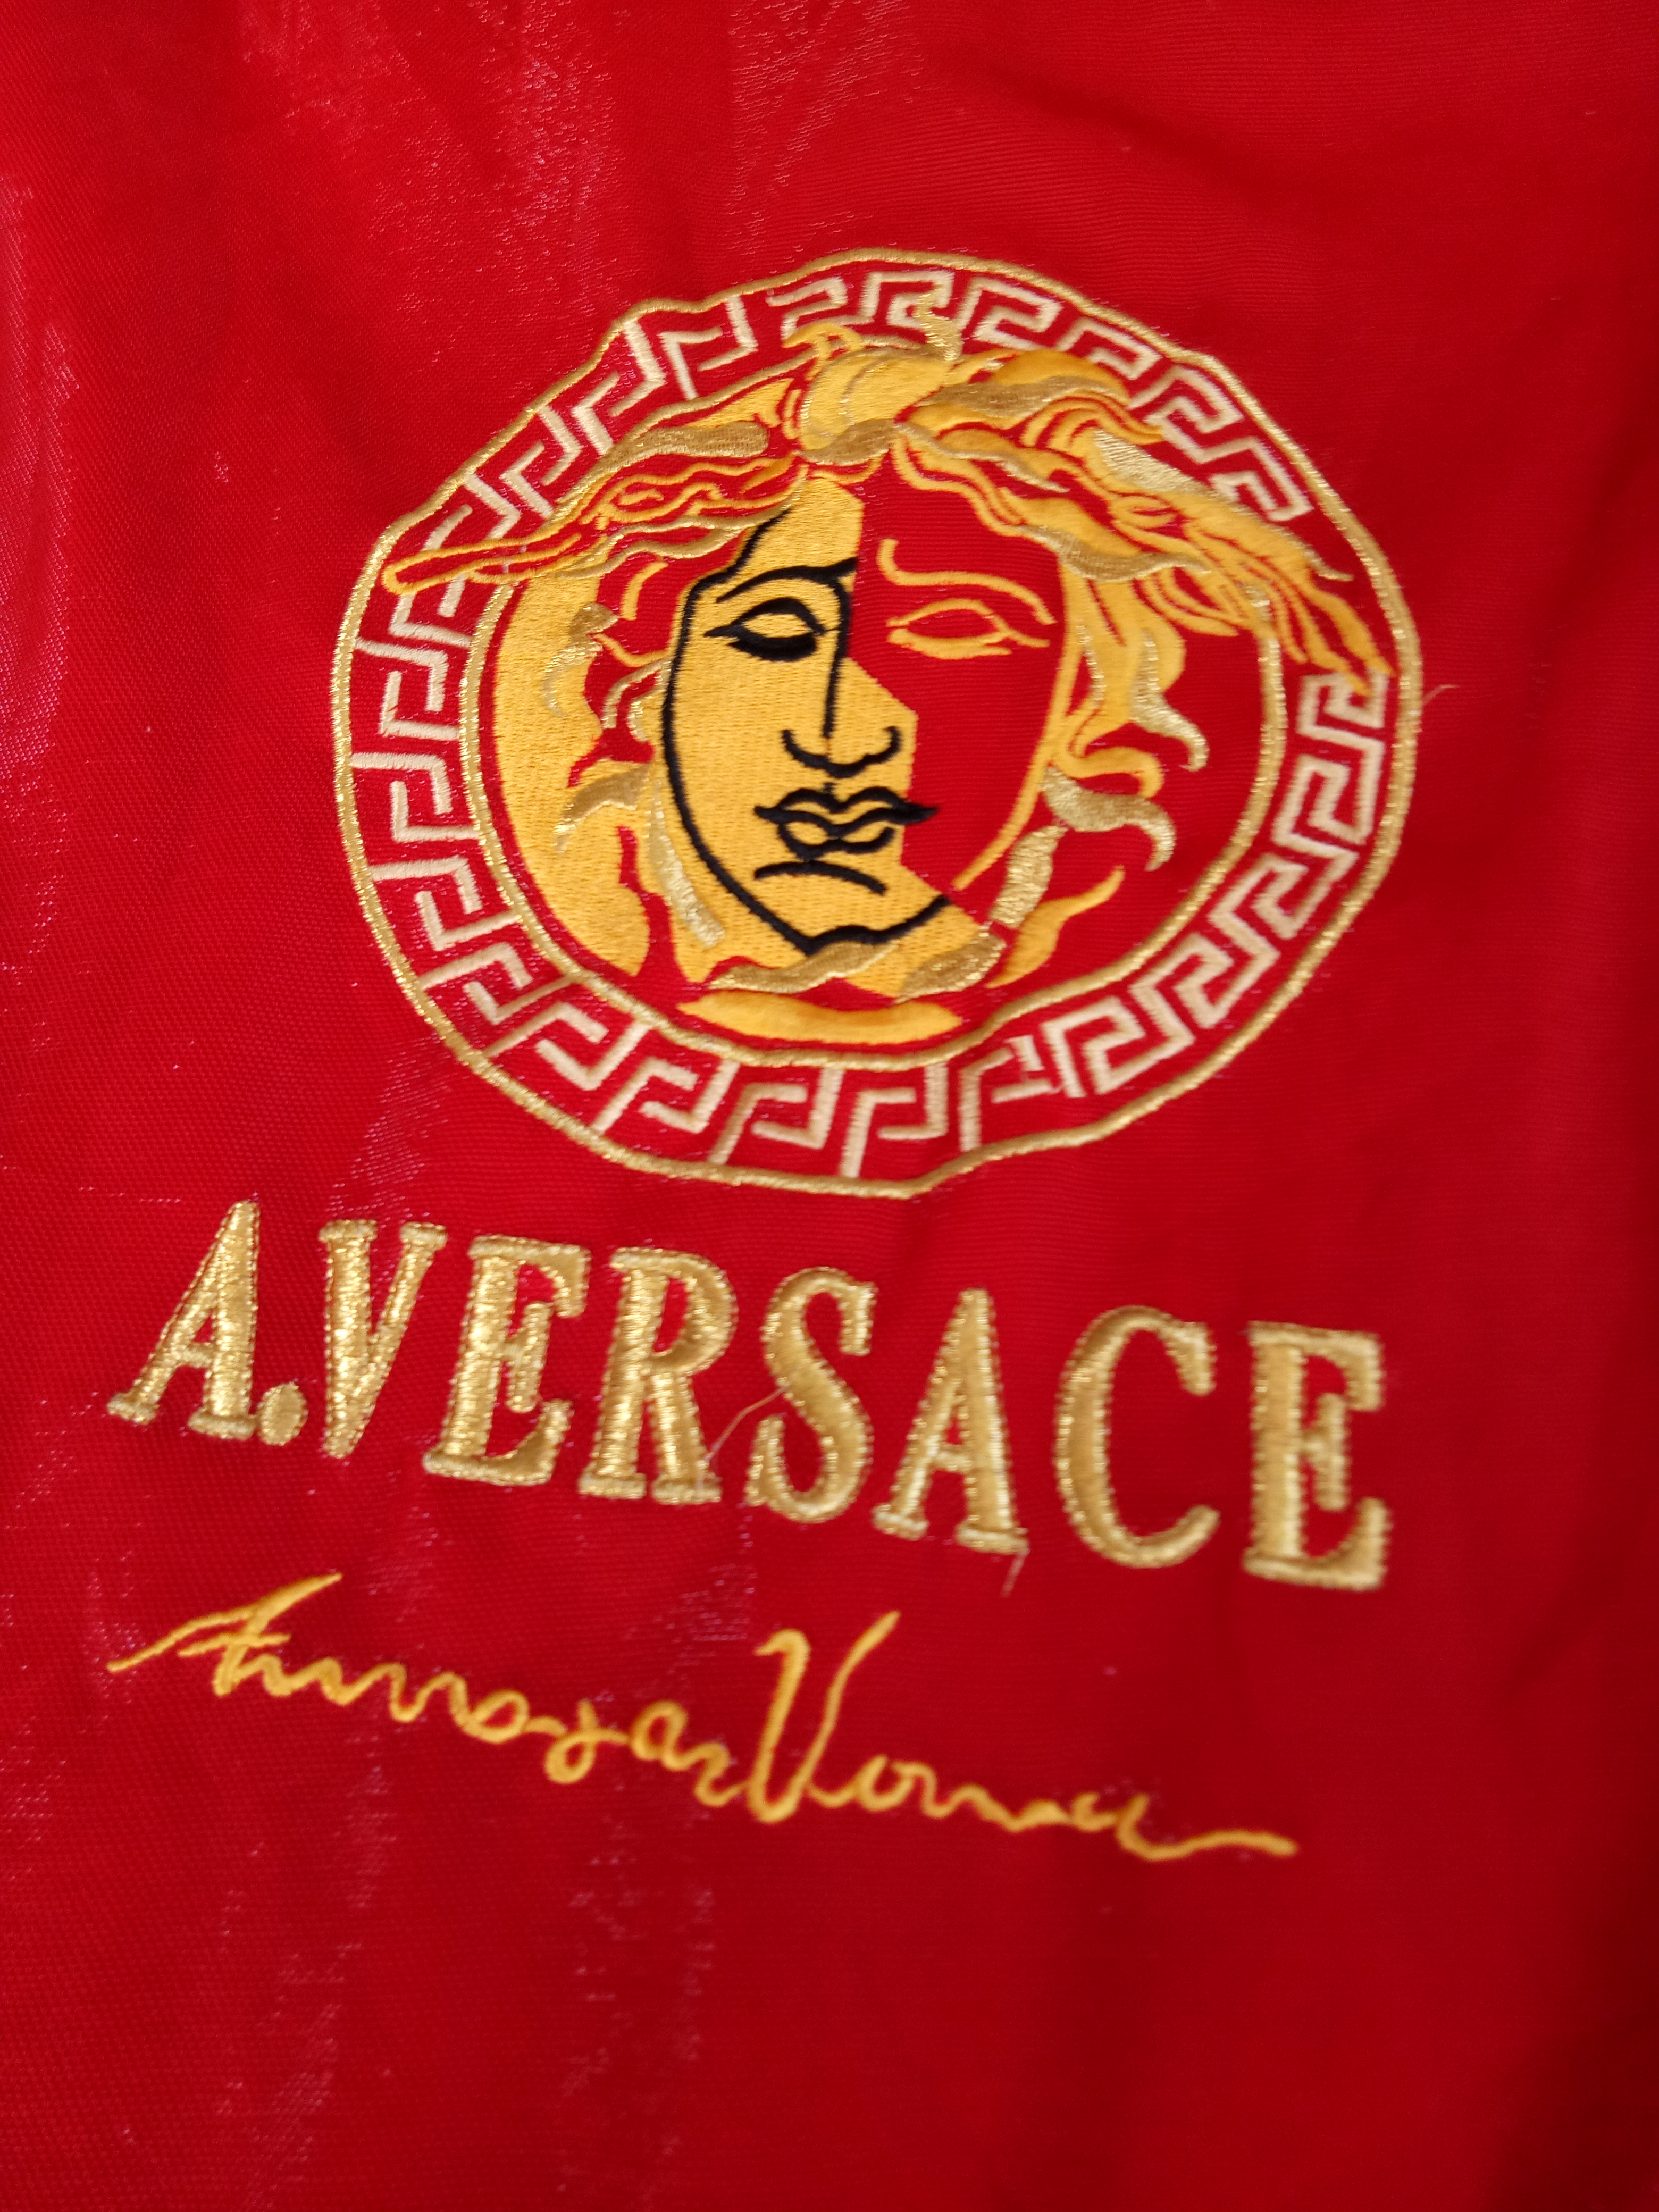 ee32f2da Versace ×. Vintage A. Versace Medusa Jacket Big Embroidery not gucci ...